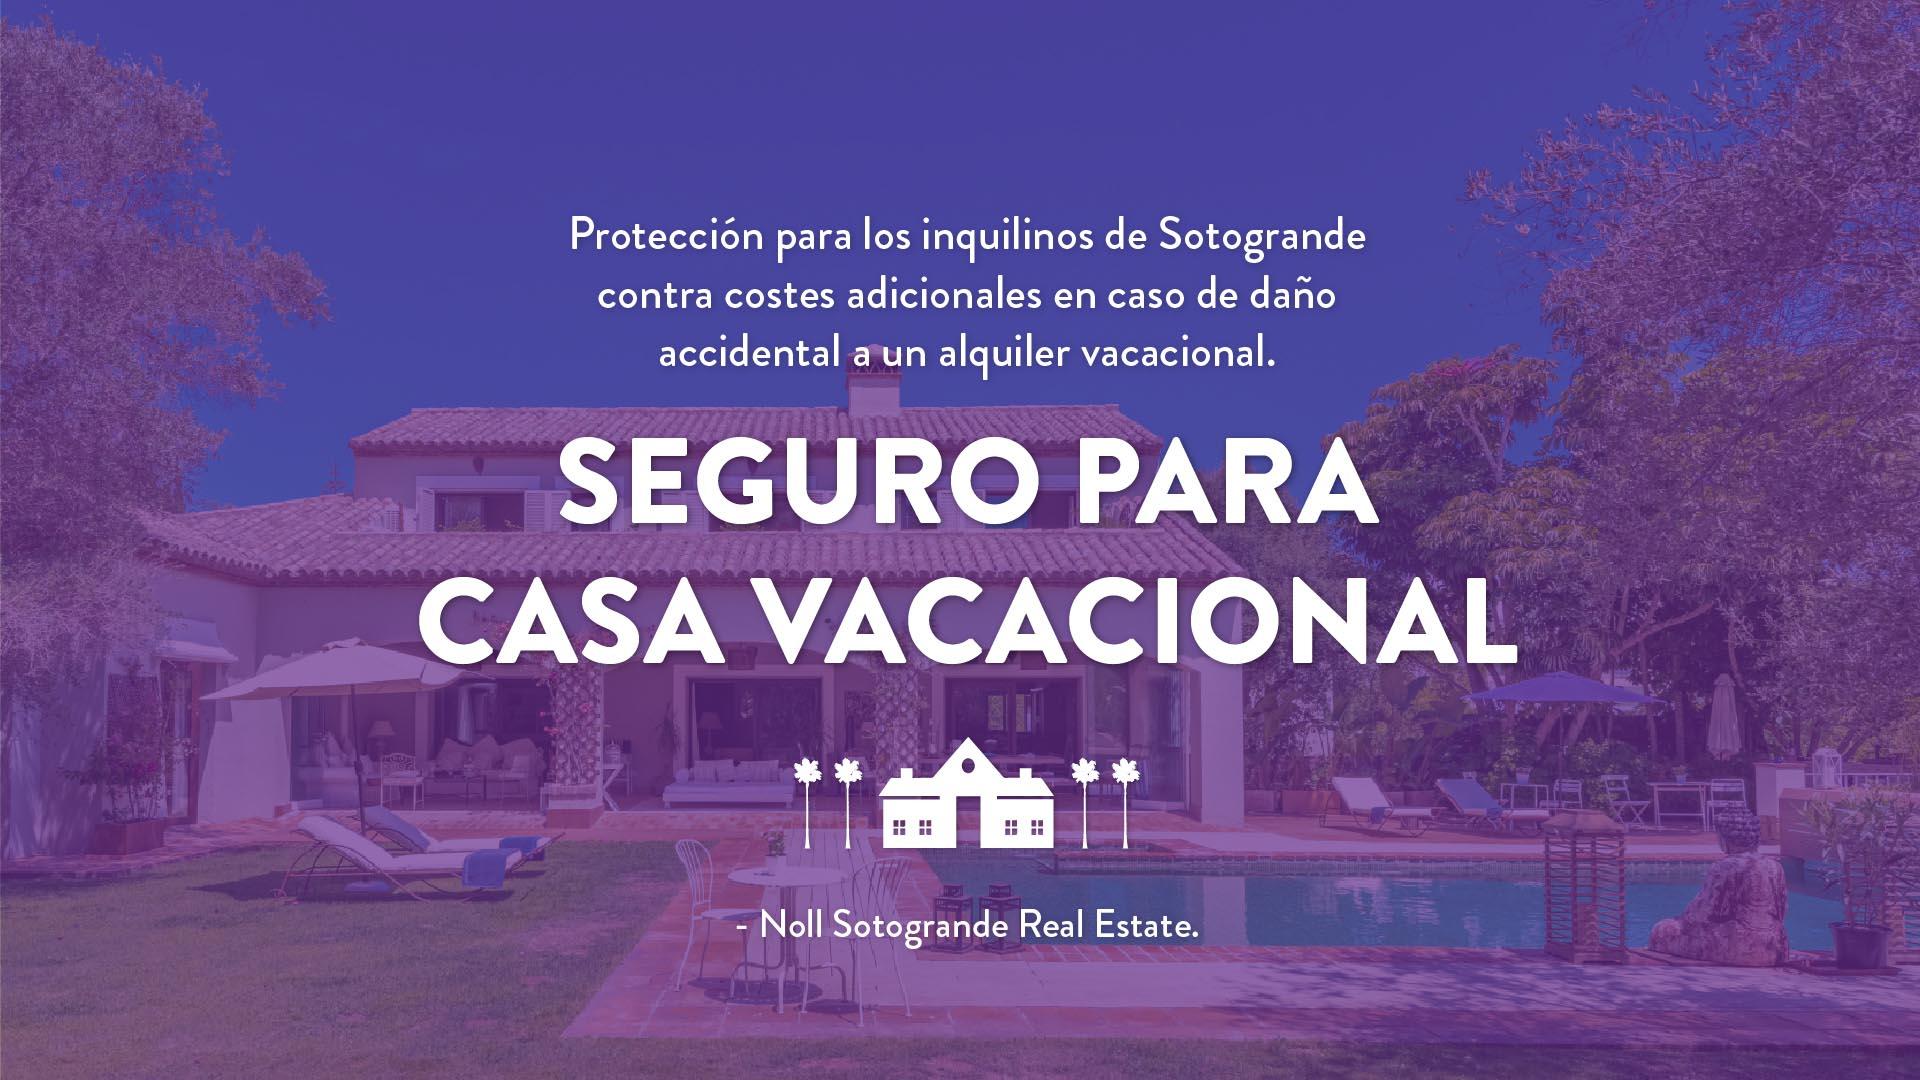 easy-rent-insurance-noll-sotogrande-real-estate_2